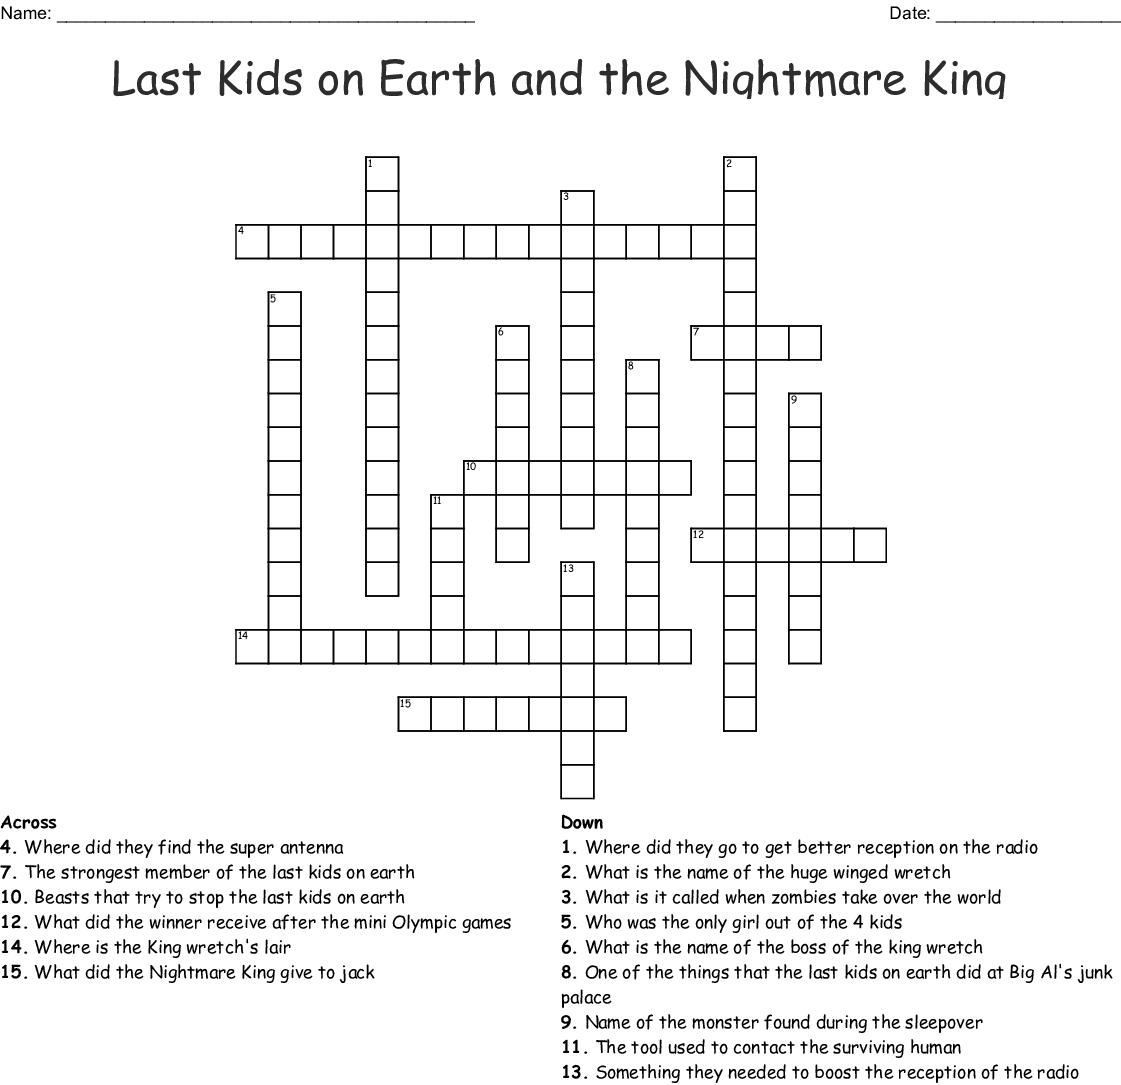 Last Kids on Earth and the Nightmare King Crossword - WordMint